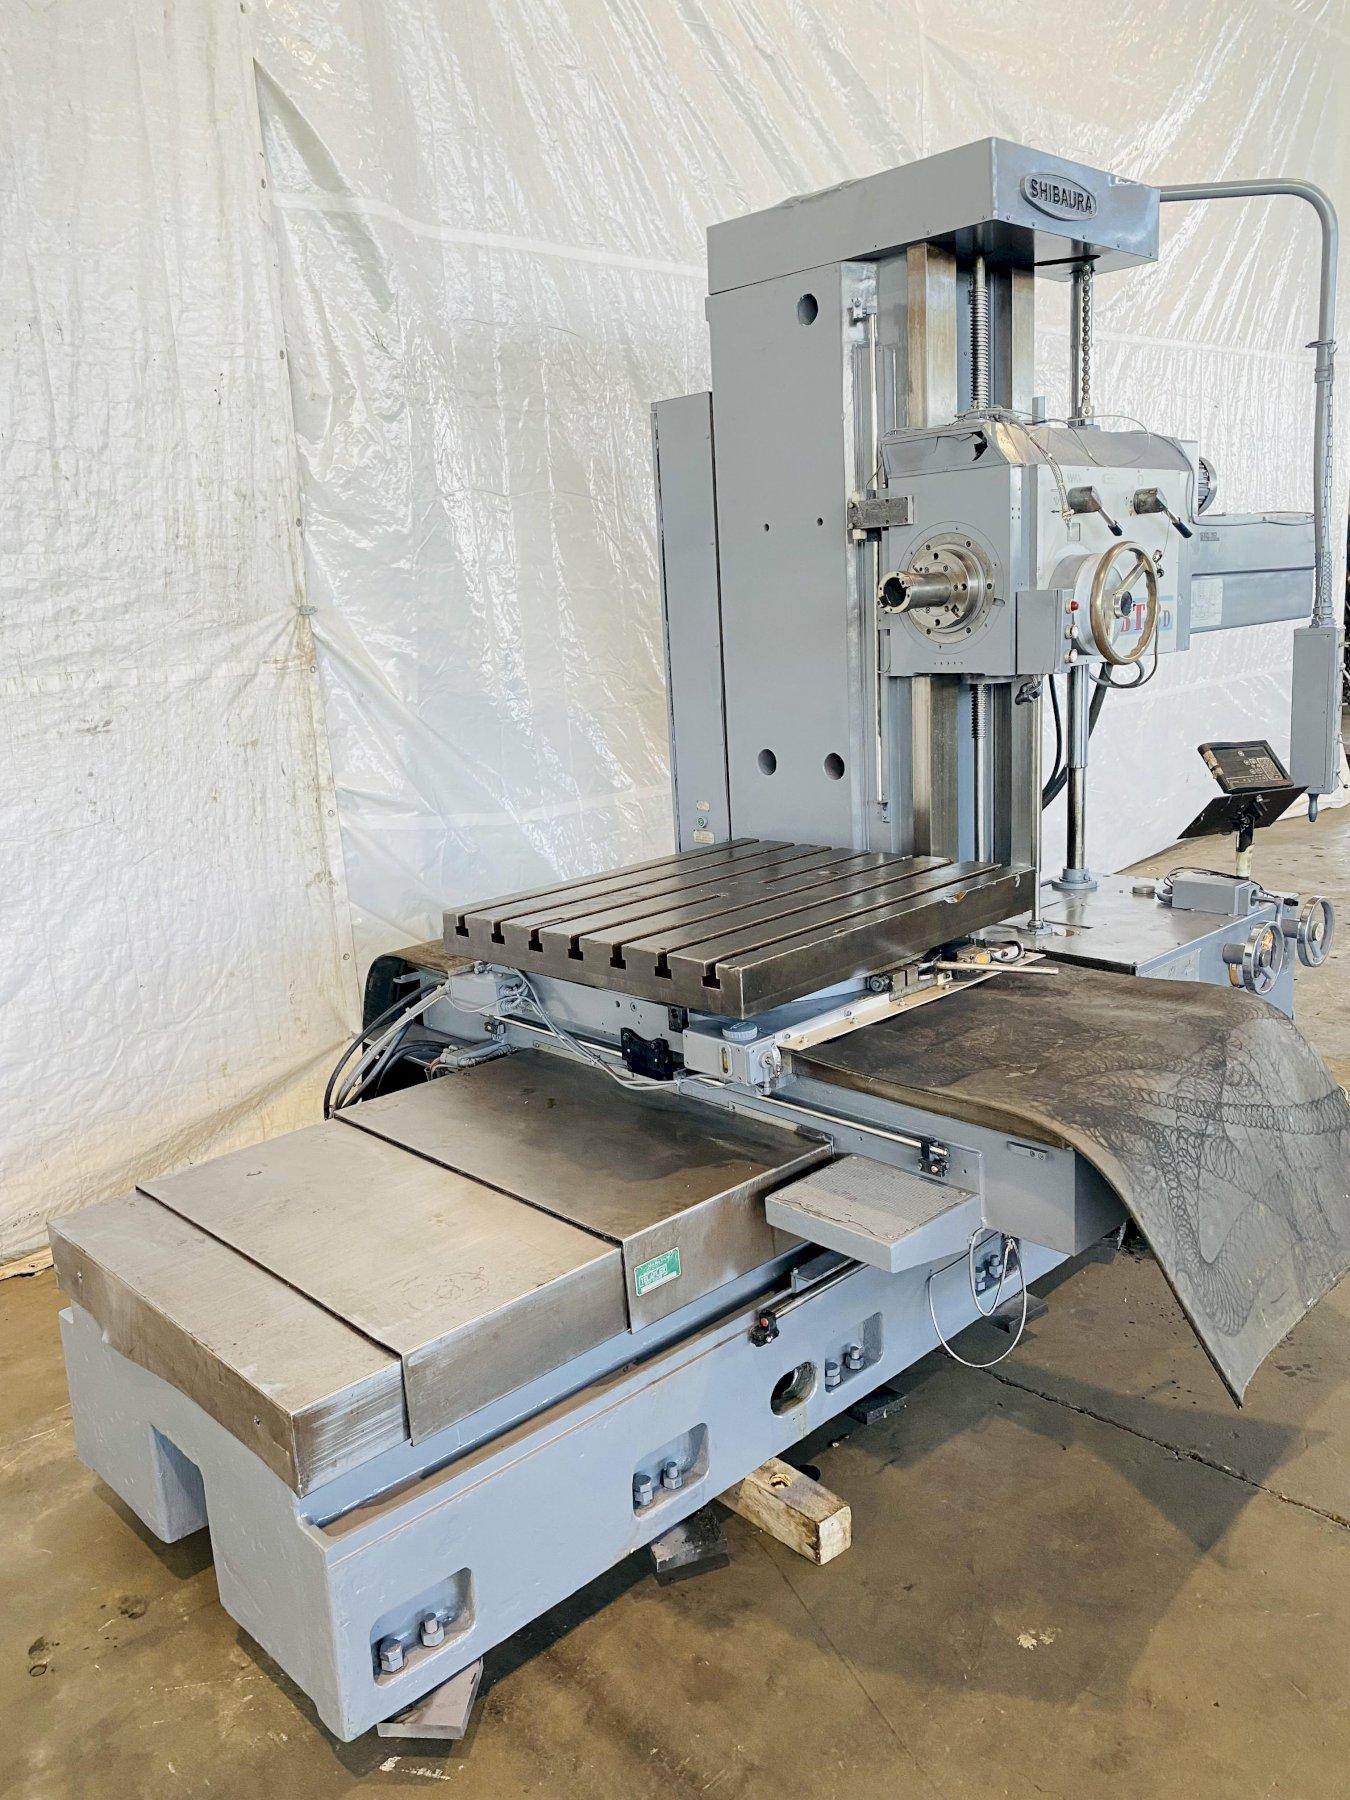 "3"" SHIBAURA BT-8D(R) 50 TAPER TABLE TYPE HORIZONTAL BORING MILL. STOCK # 0844421"